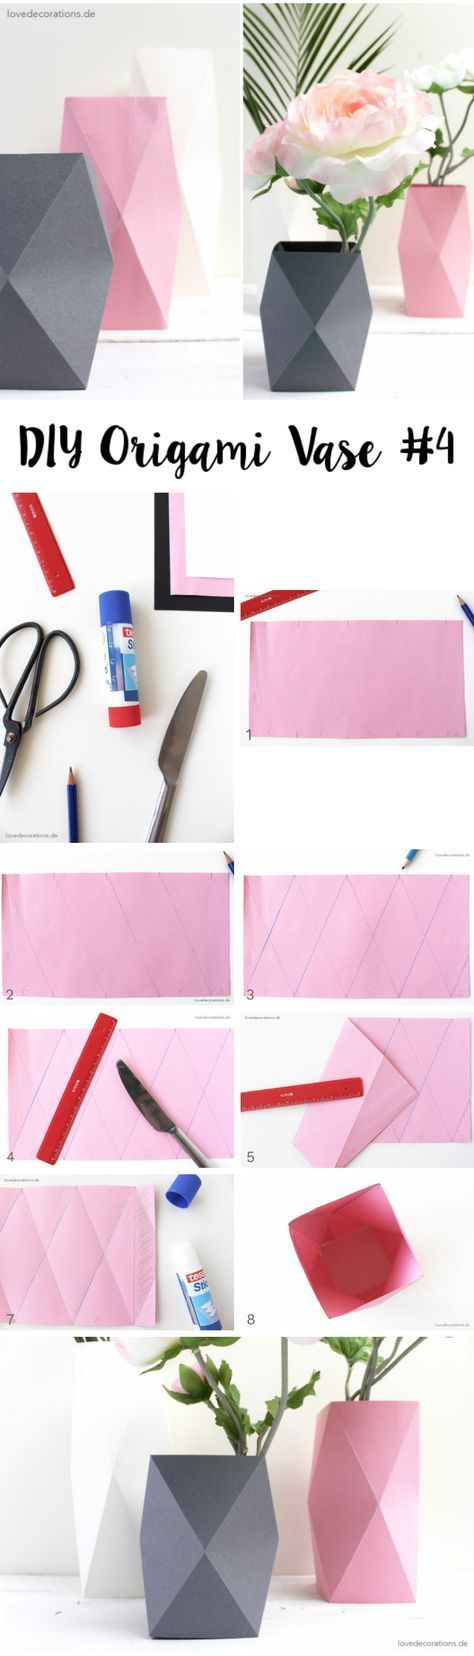 Fold your own DIY Origami Vase #4